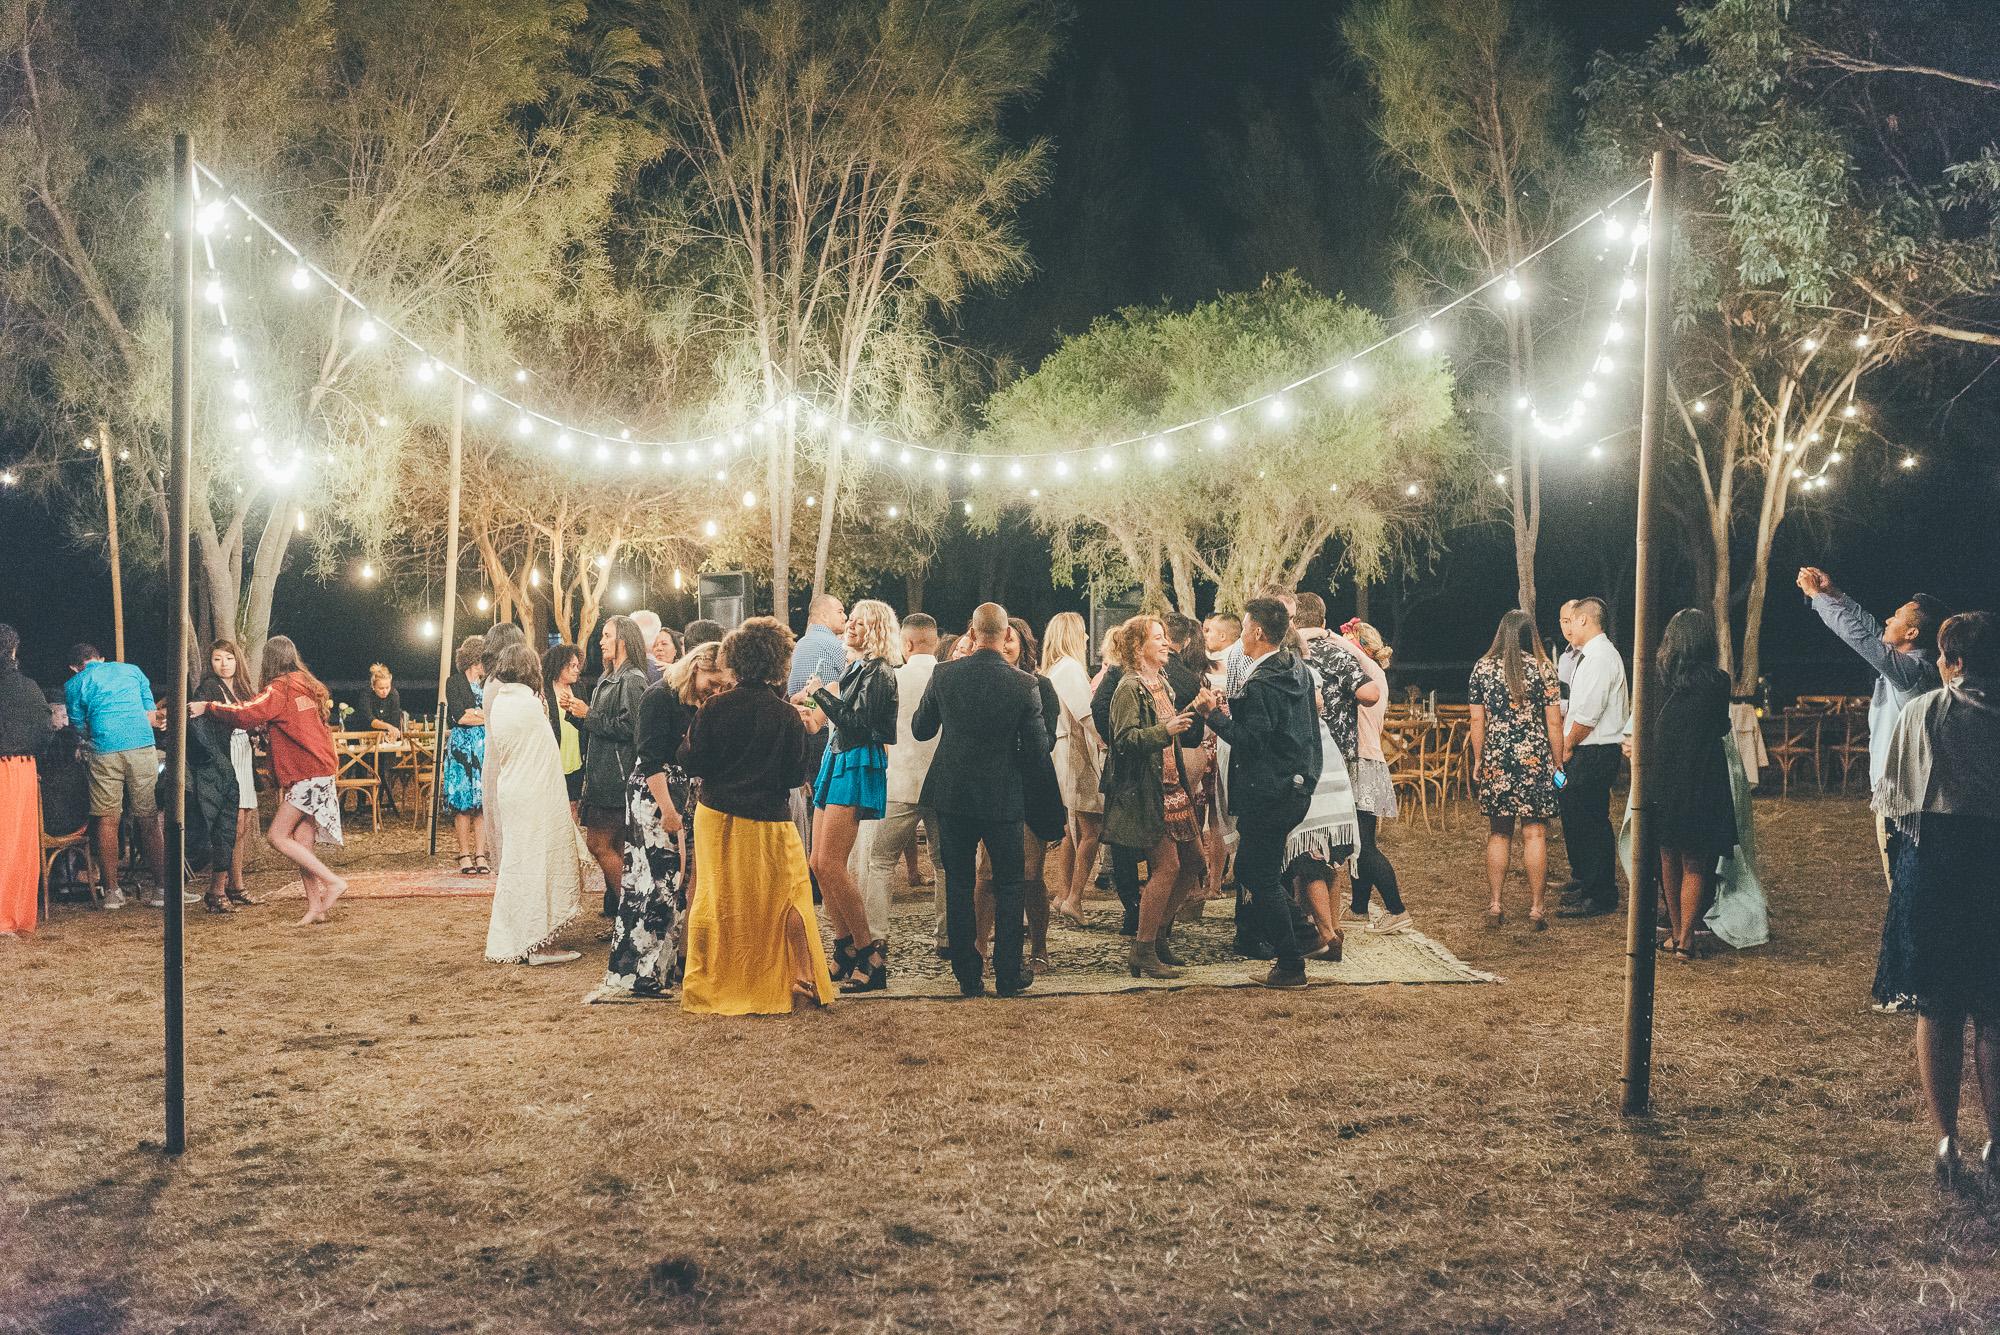 wedding-photographer-outdoor-casual-styled-los-angeles-australia-california-international-earthbound -98.jpg